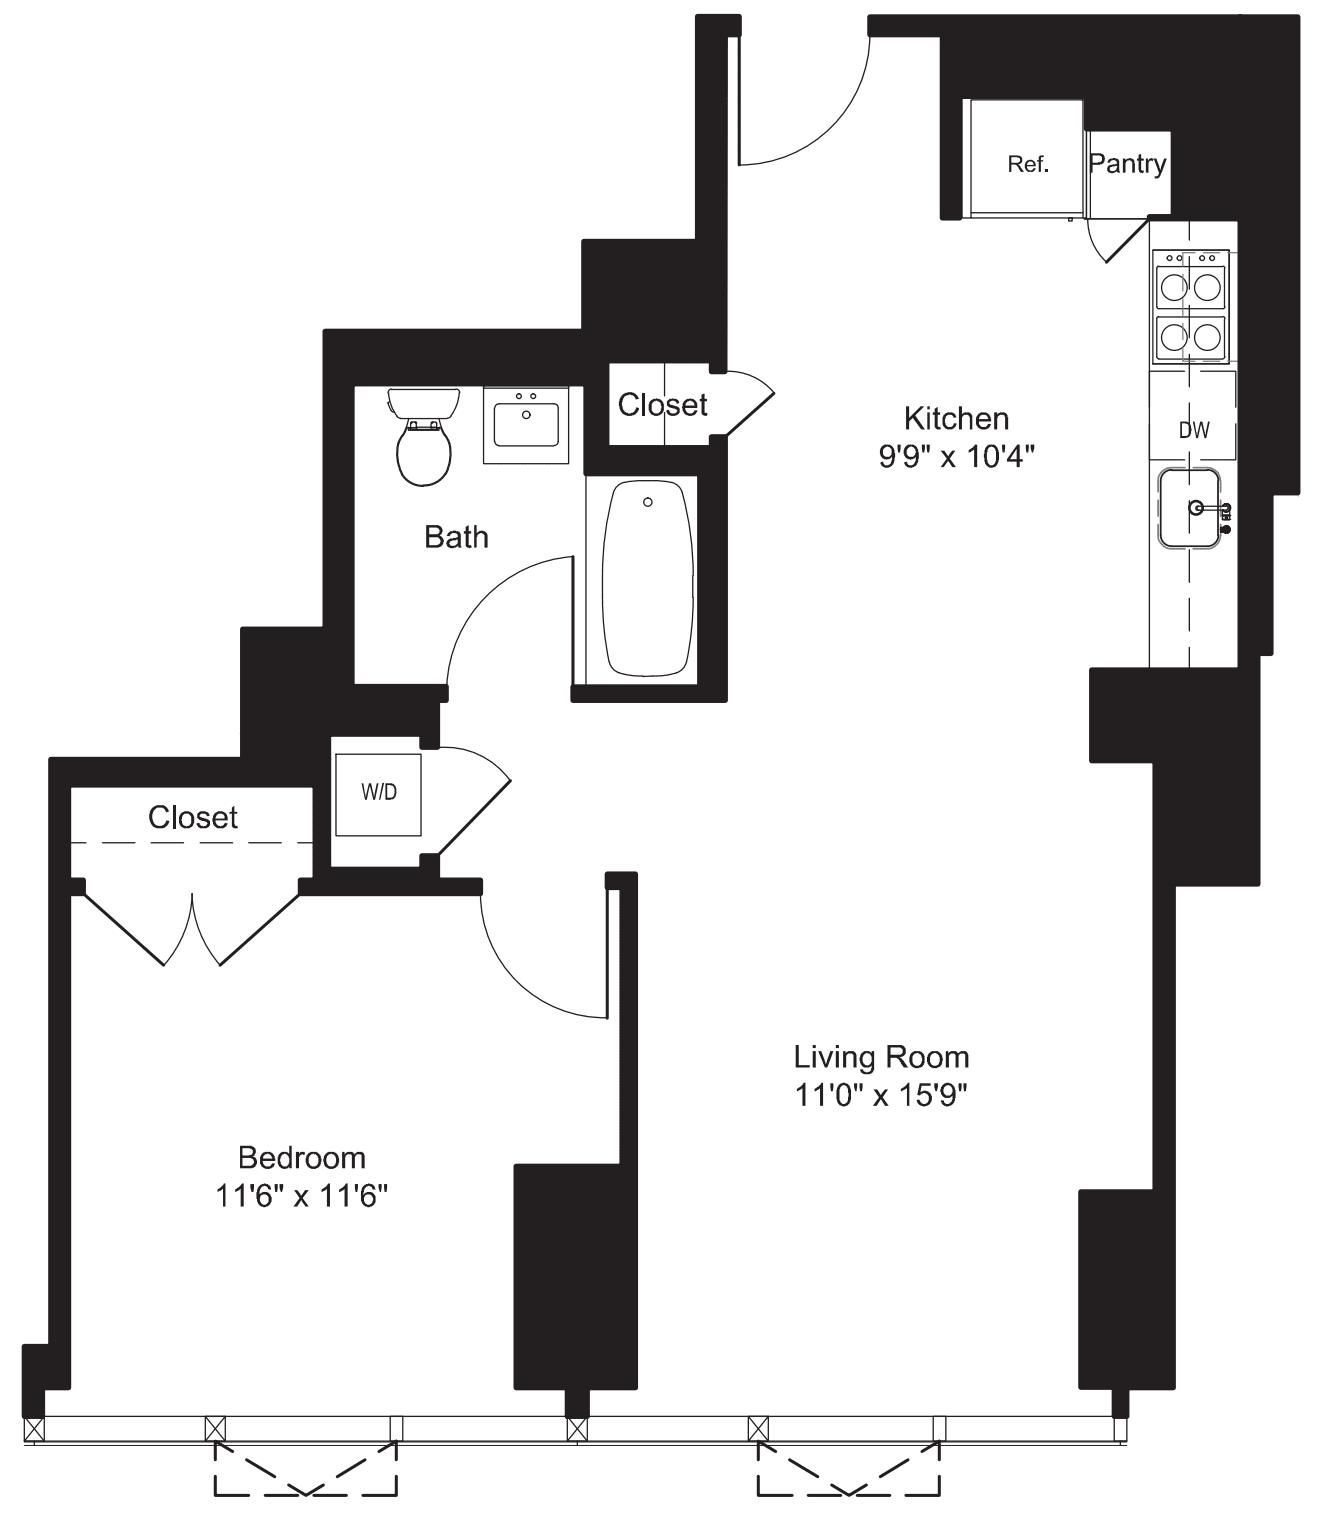 One Bedroom L 7-19